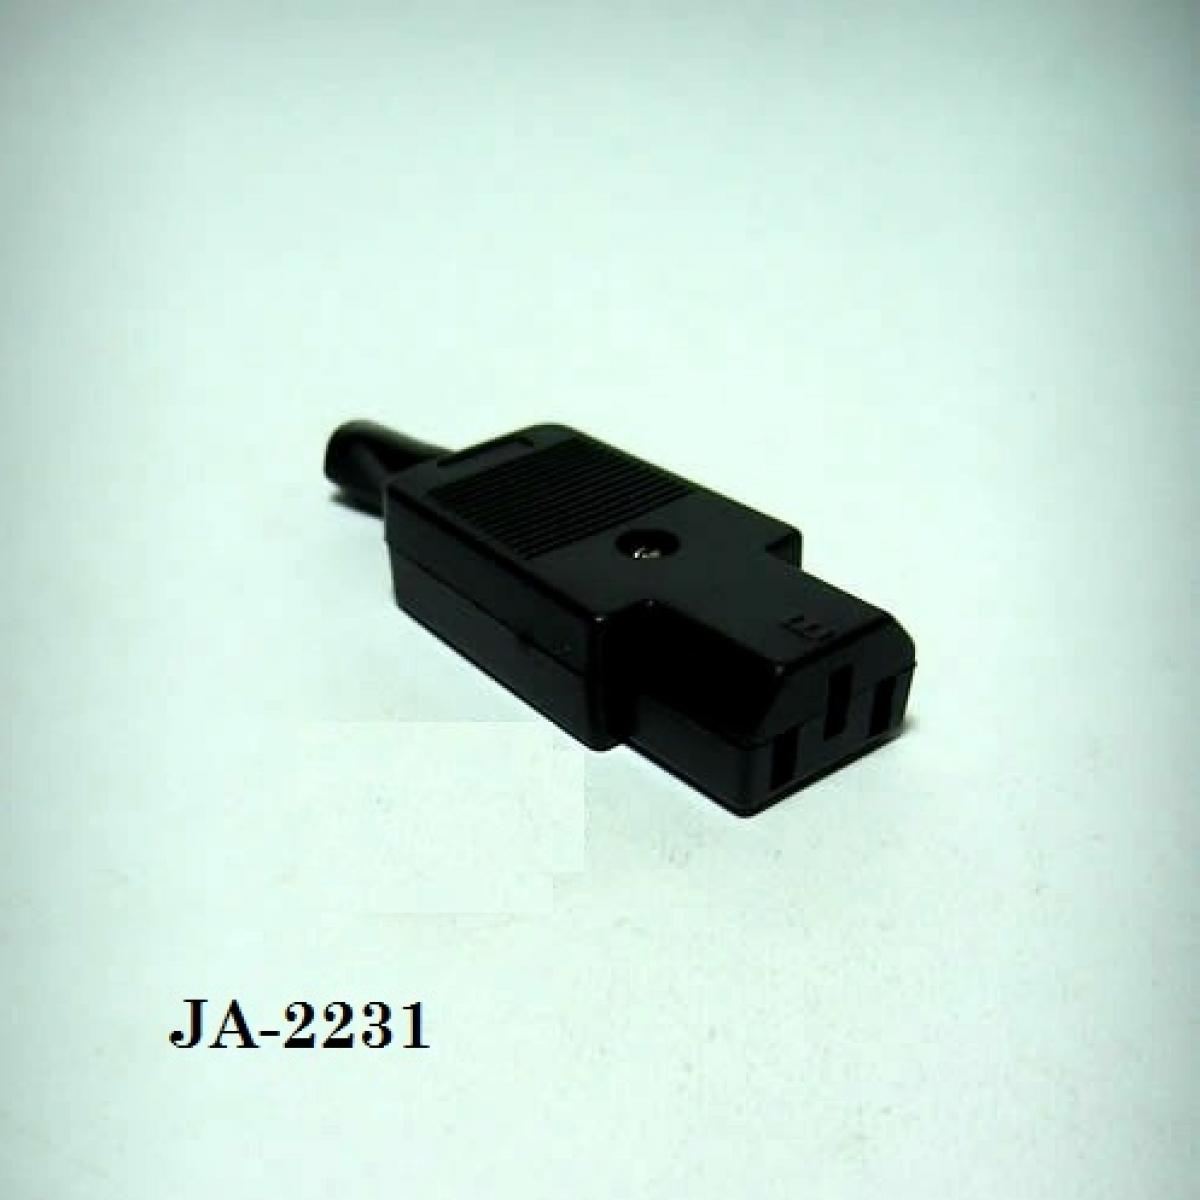 JA-2231 AC KABLO TİPİ DİŞİ KONNEKTOR